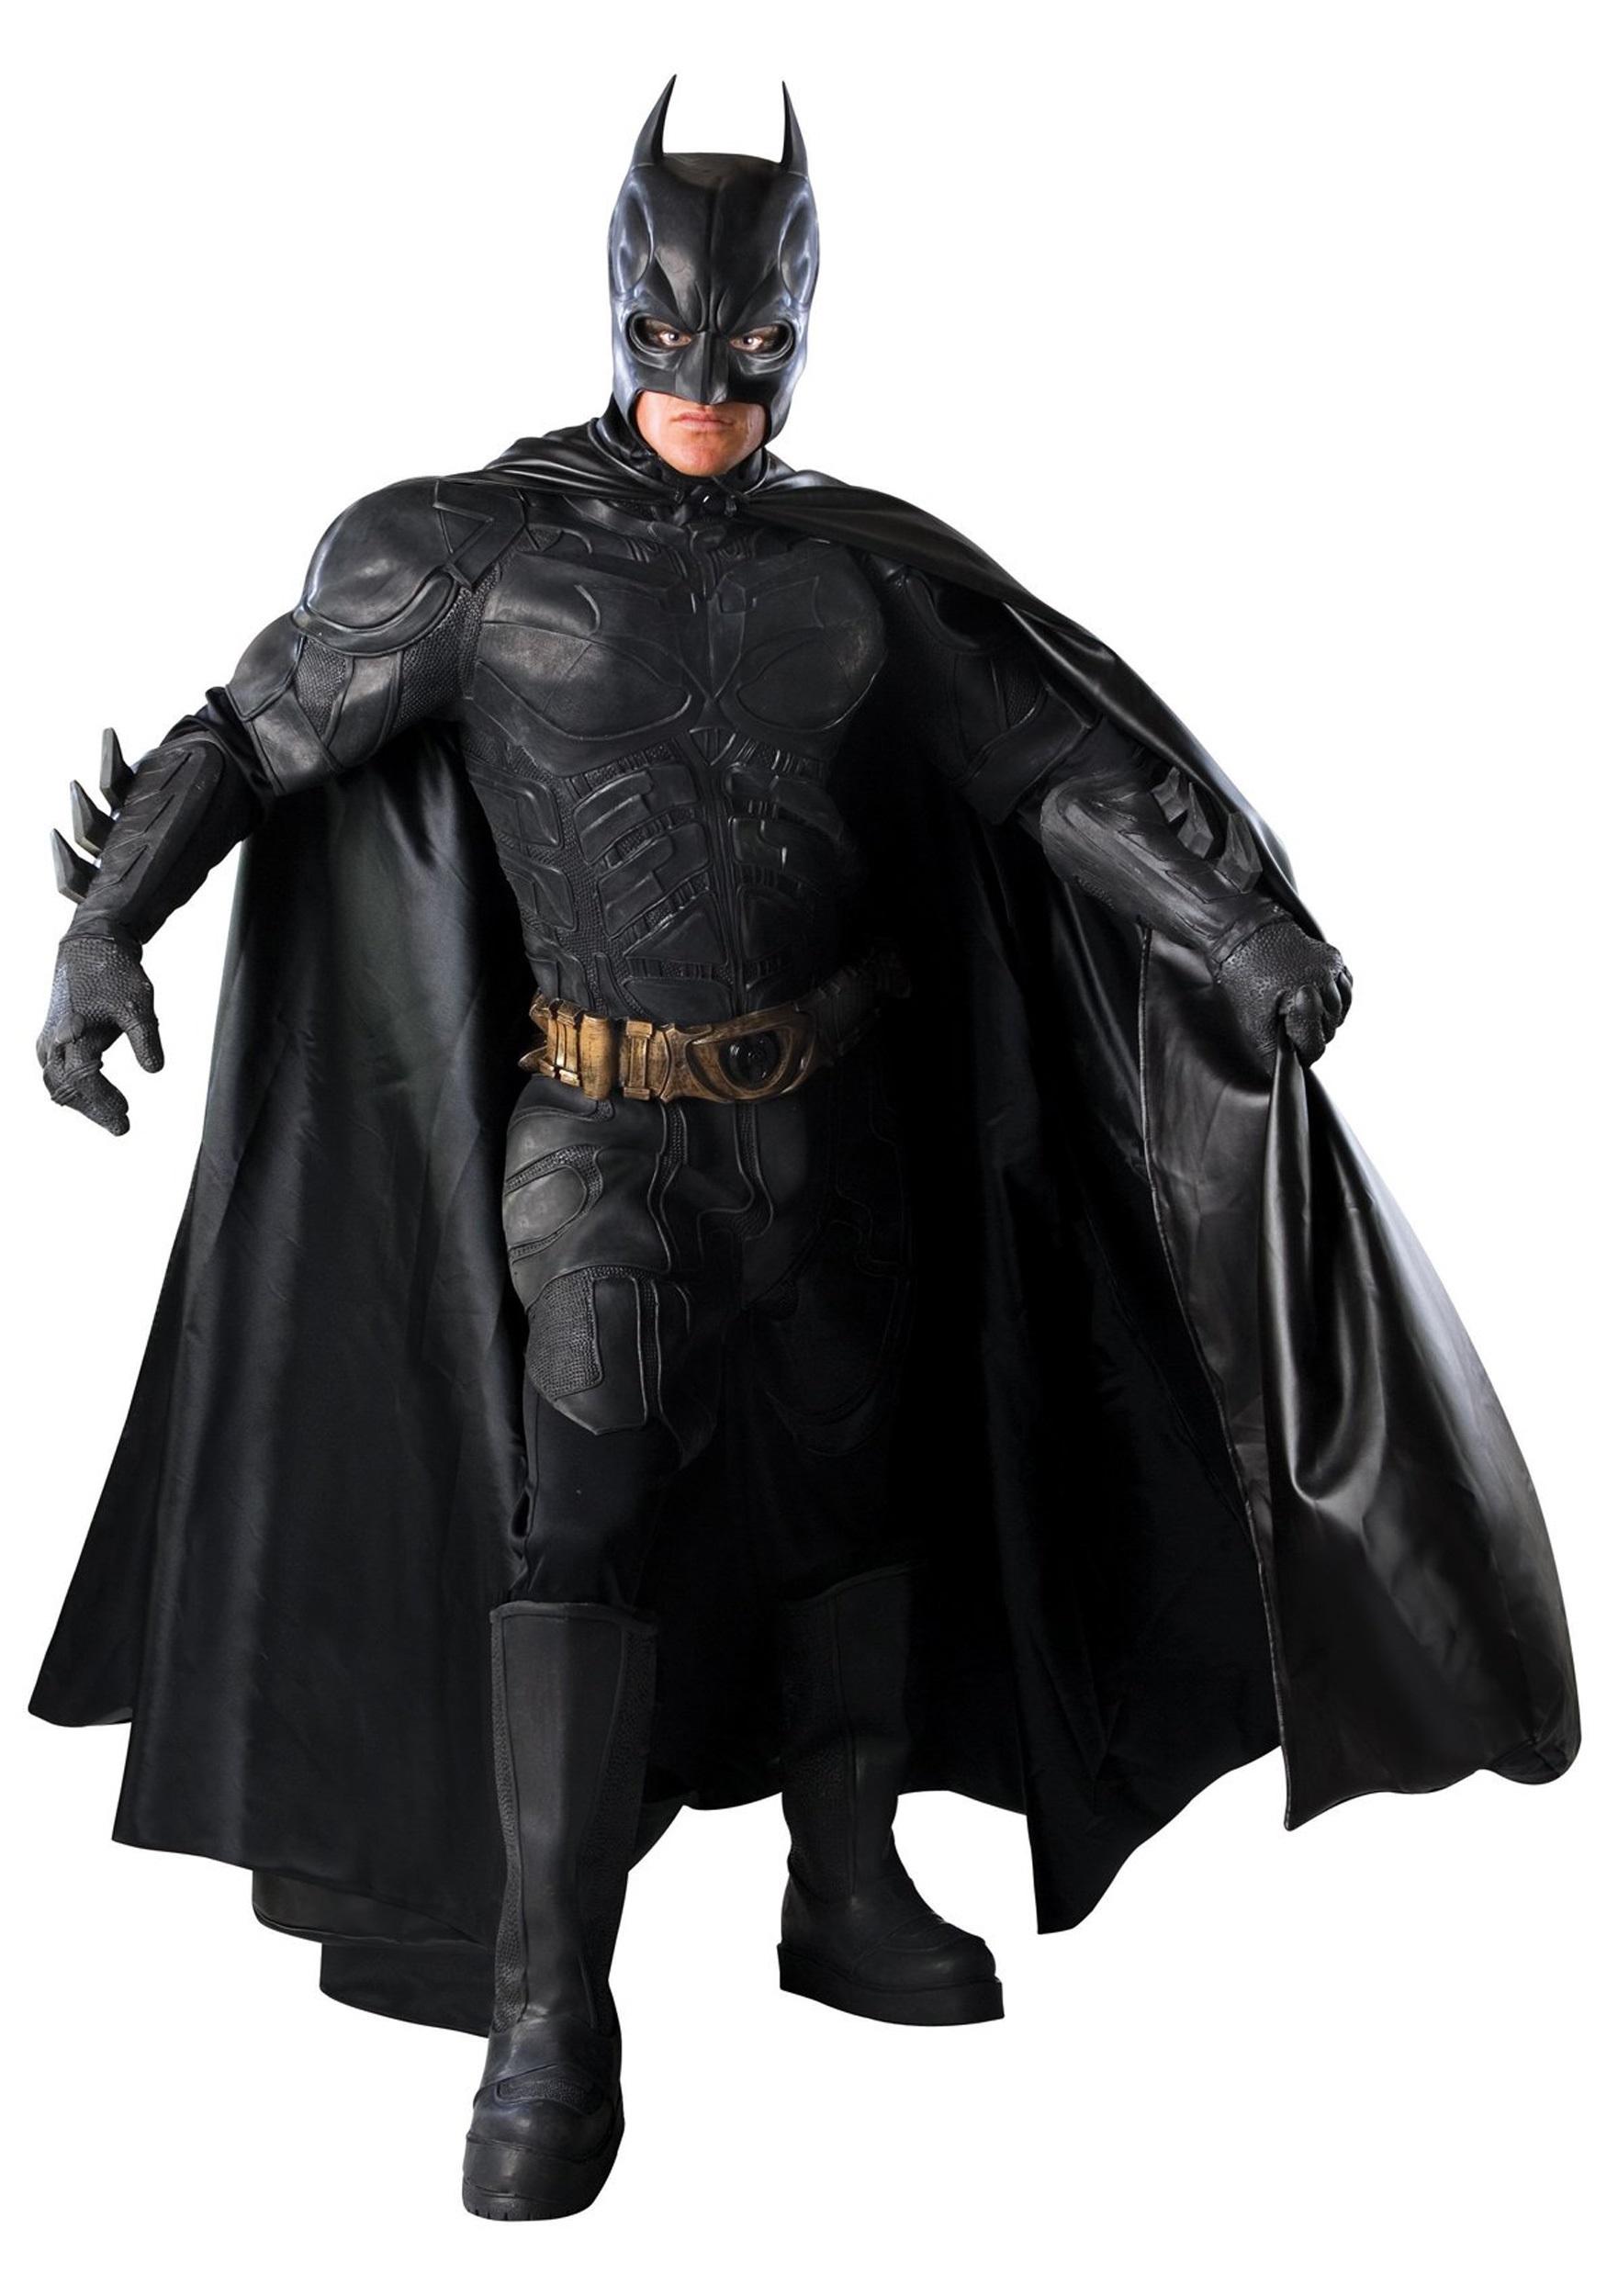 Authentic Dark Knight Costume  sc 1 st  Halloween Costume & Authentic Dark Knight Batman Costume - Adult Authentic Batman Costumes